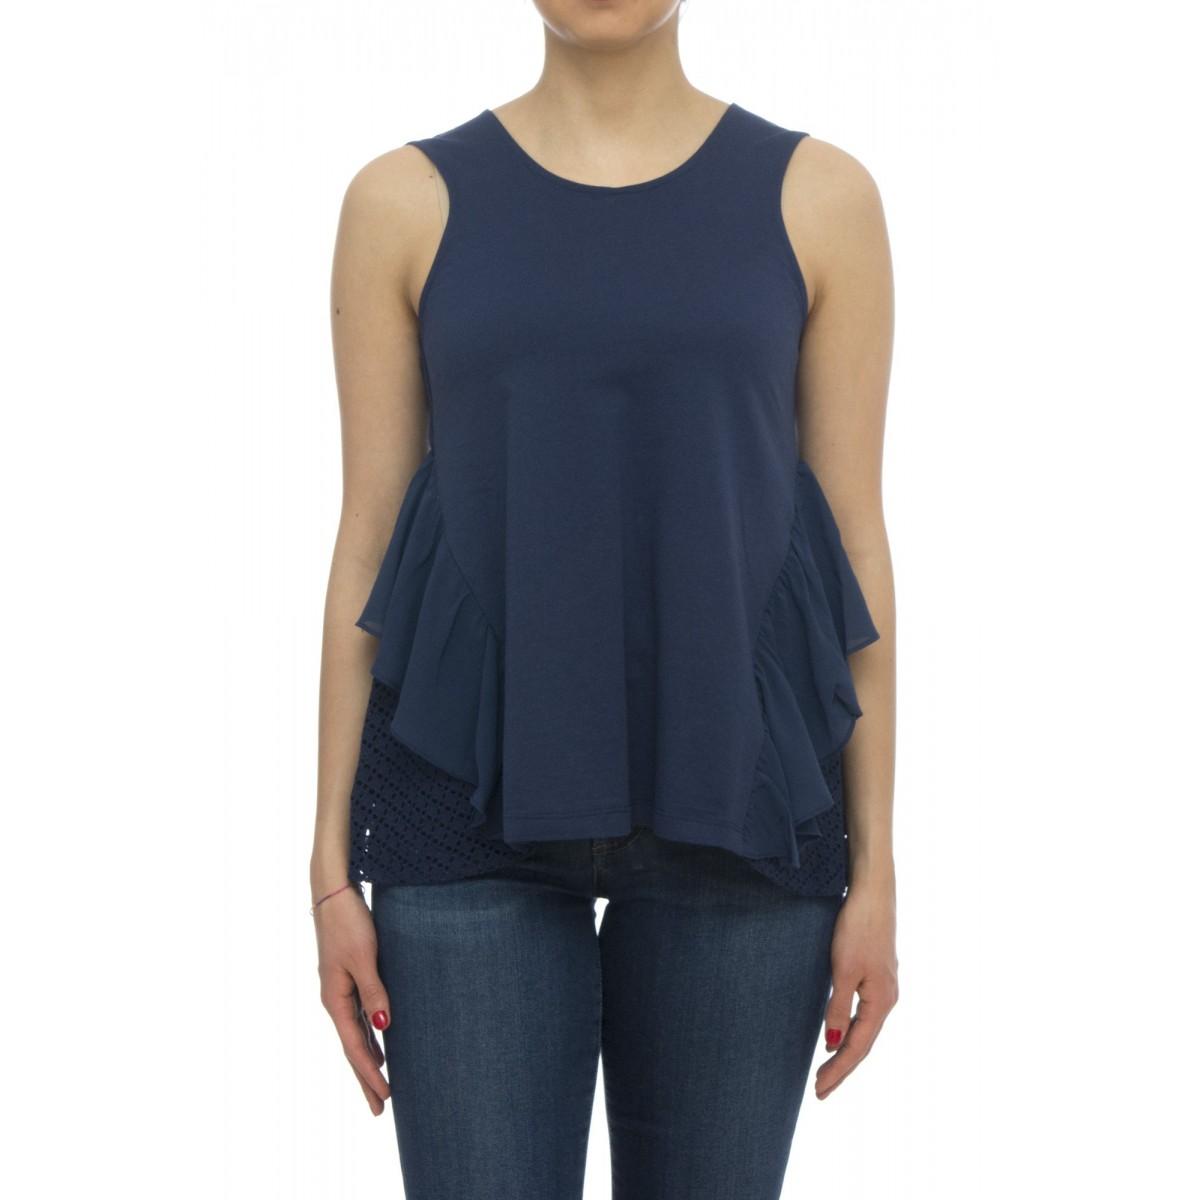 T-shirt - Nueva t-shirt lavorato